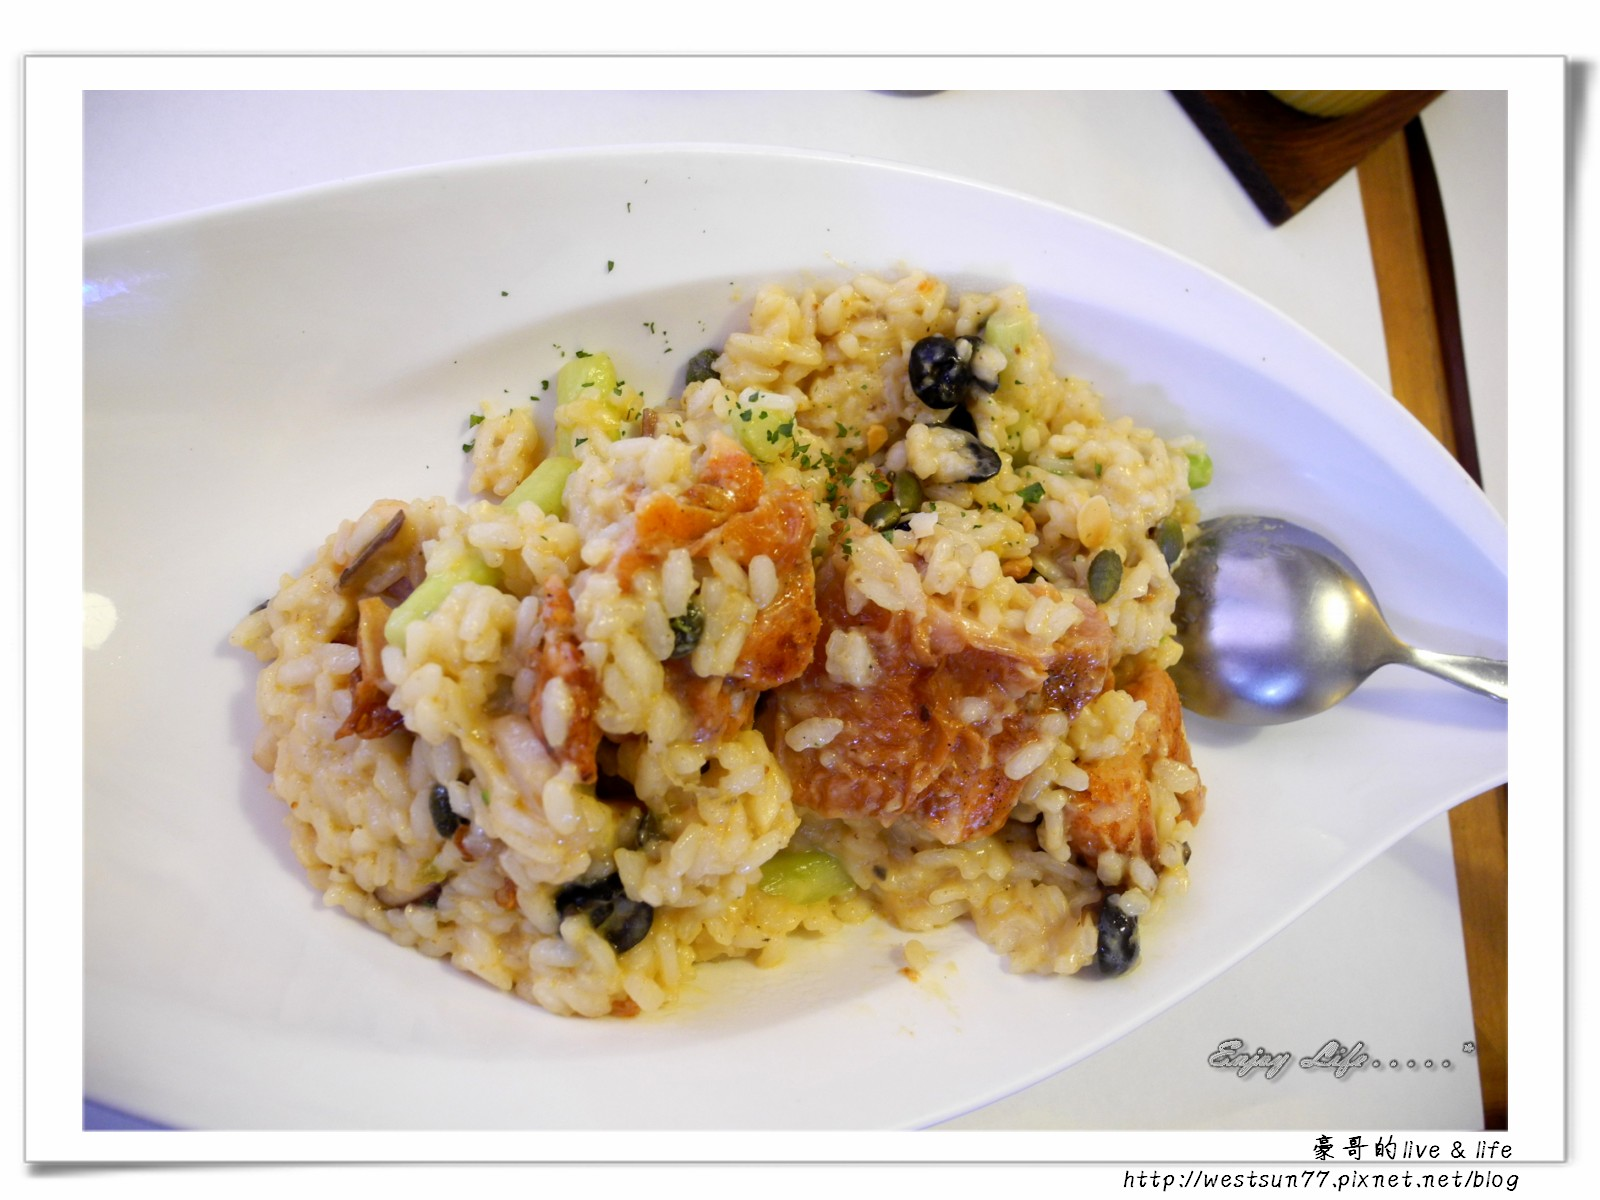 Joy's Cafe 喬帝瑭餐廳 09.jpg